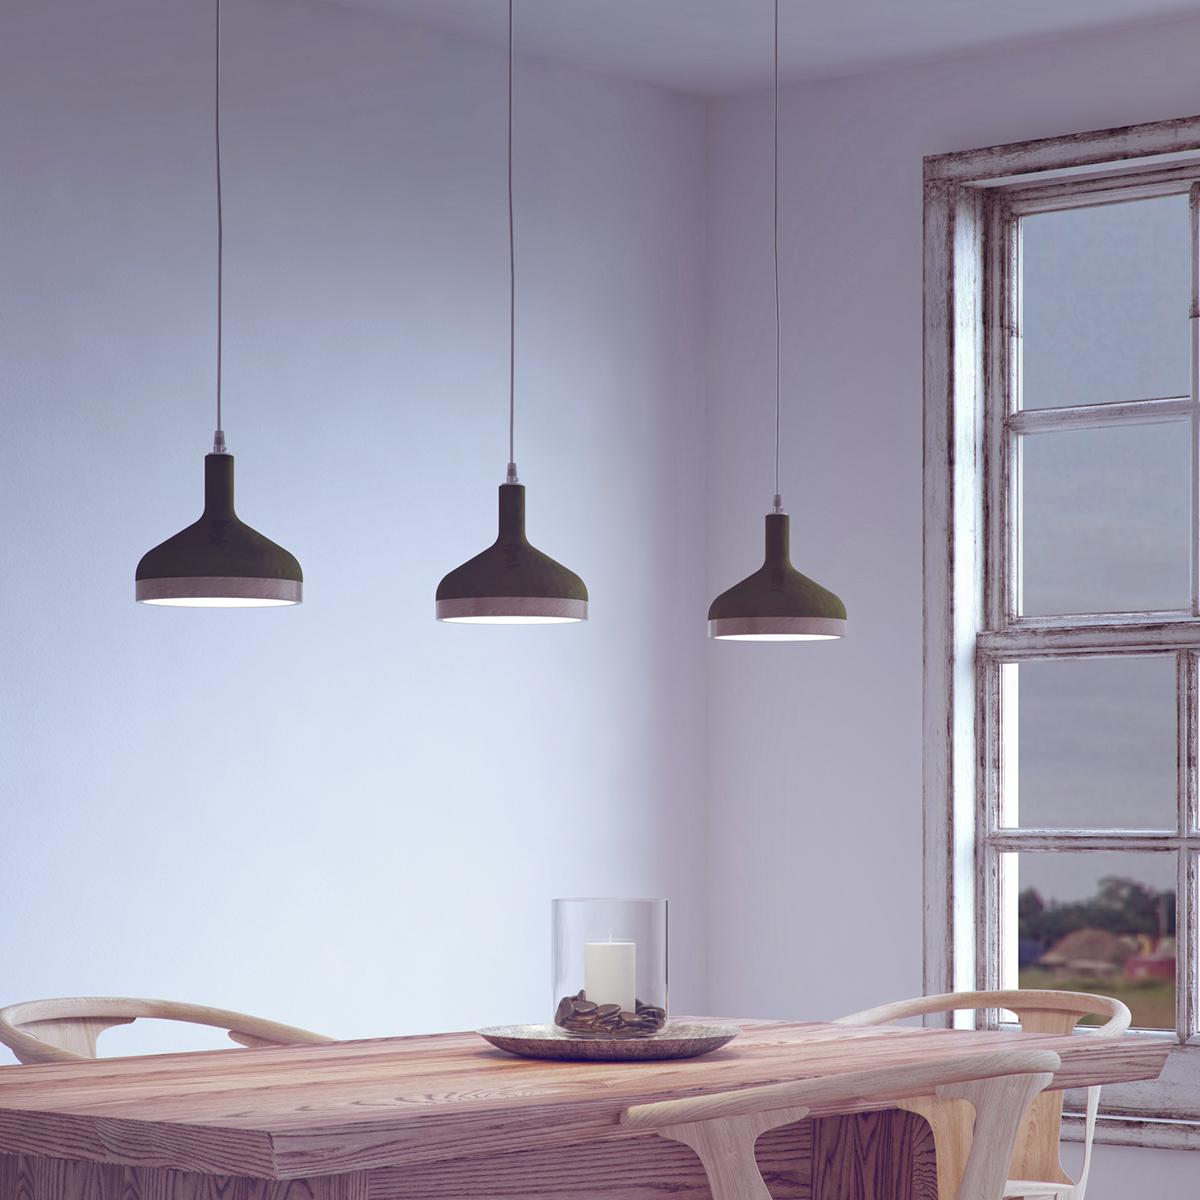 Plera Lamp by Enrico Zanolla - 05